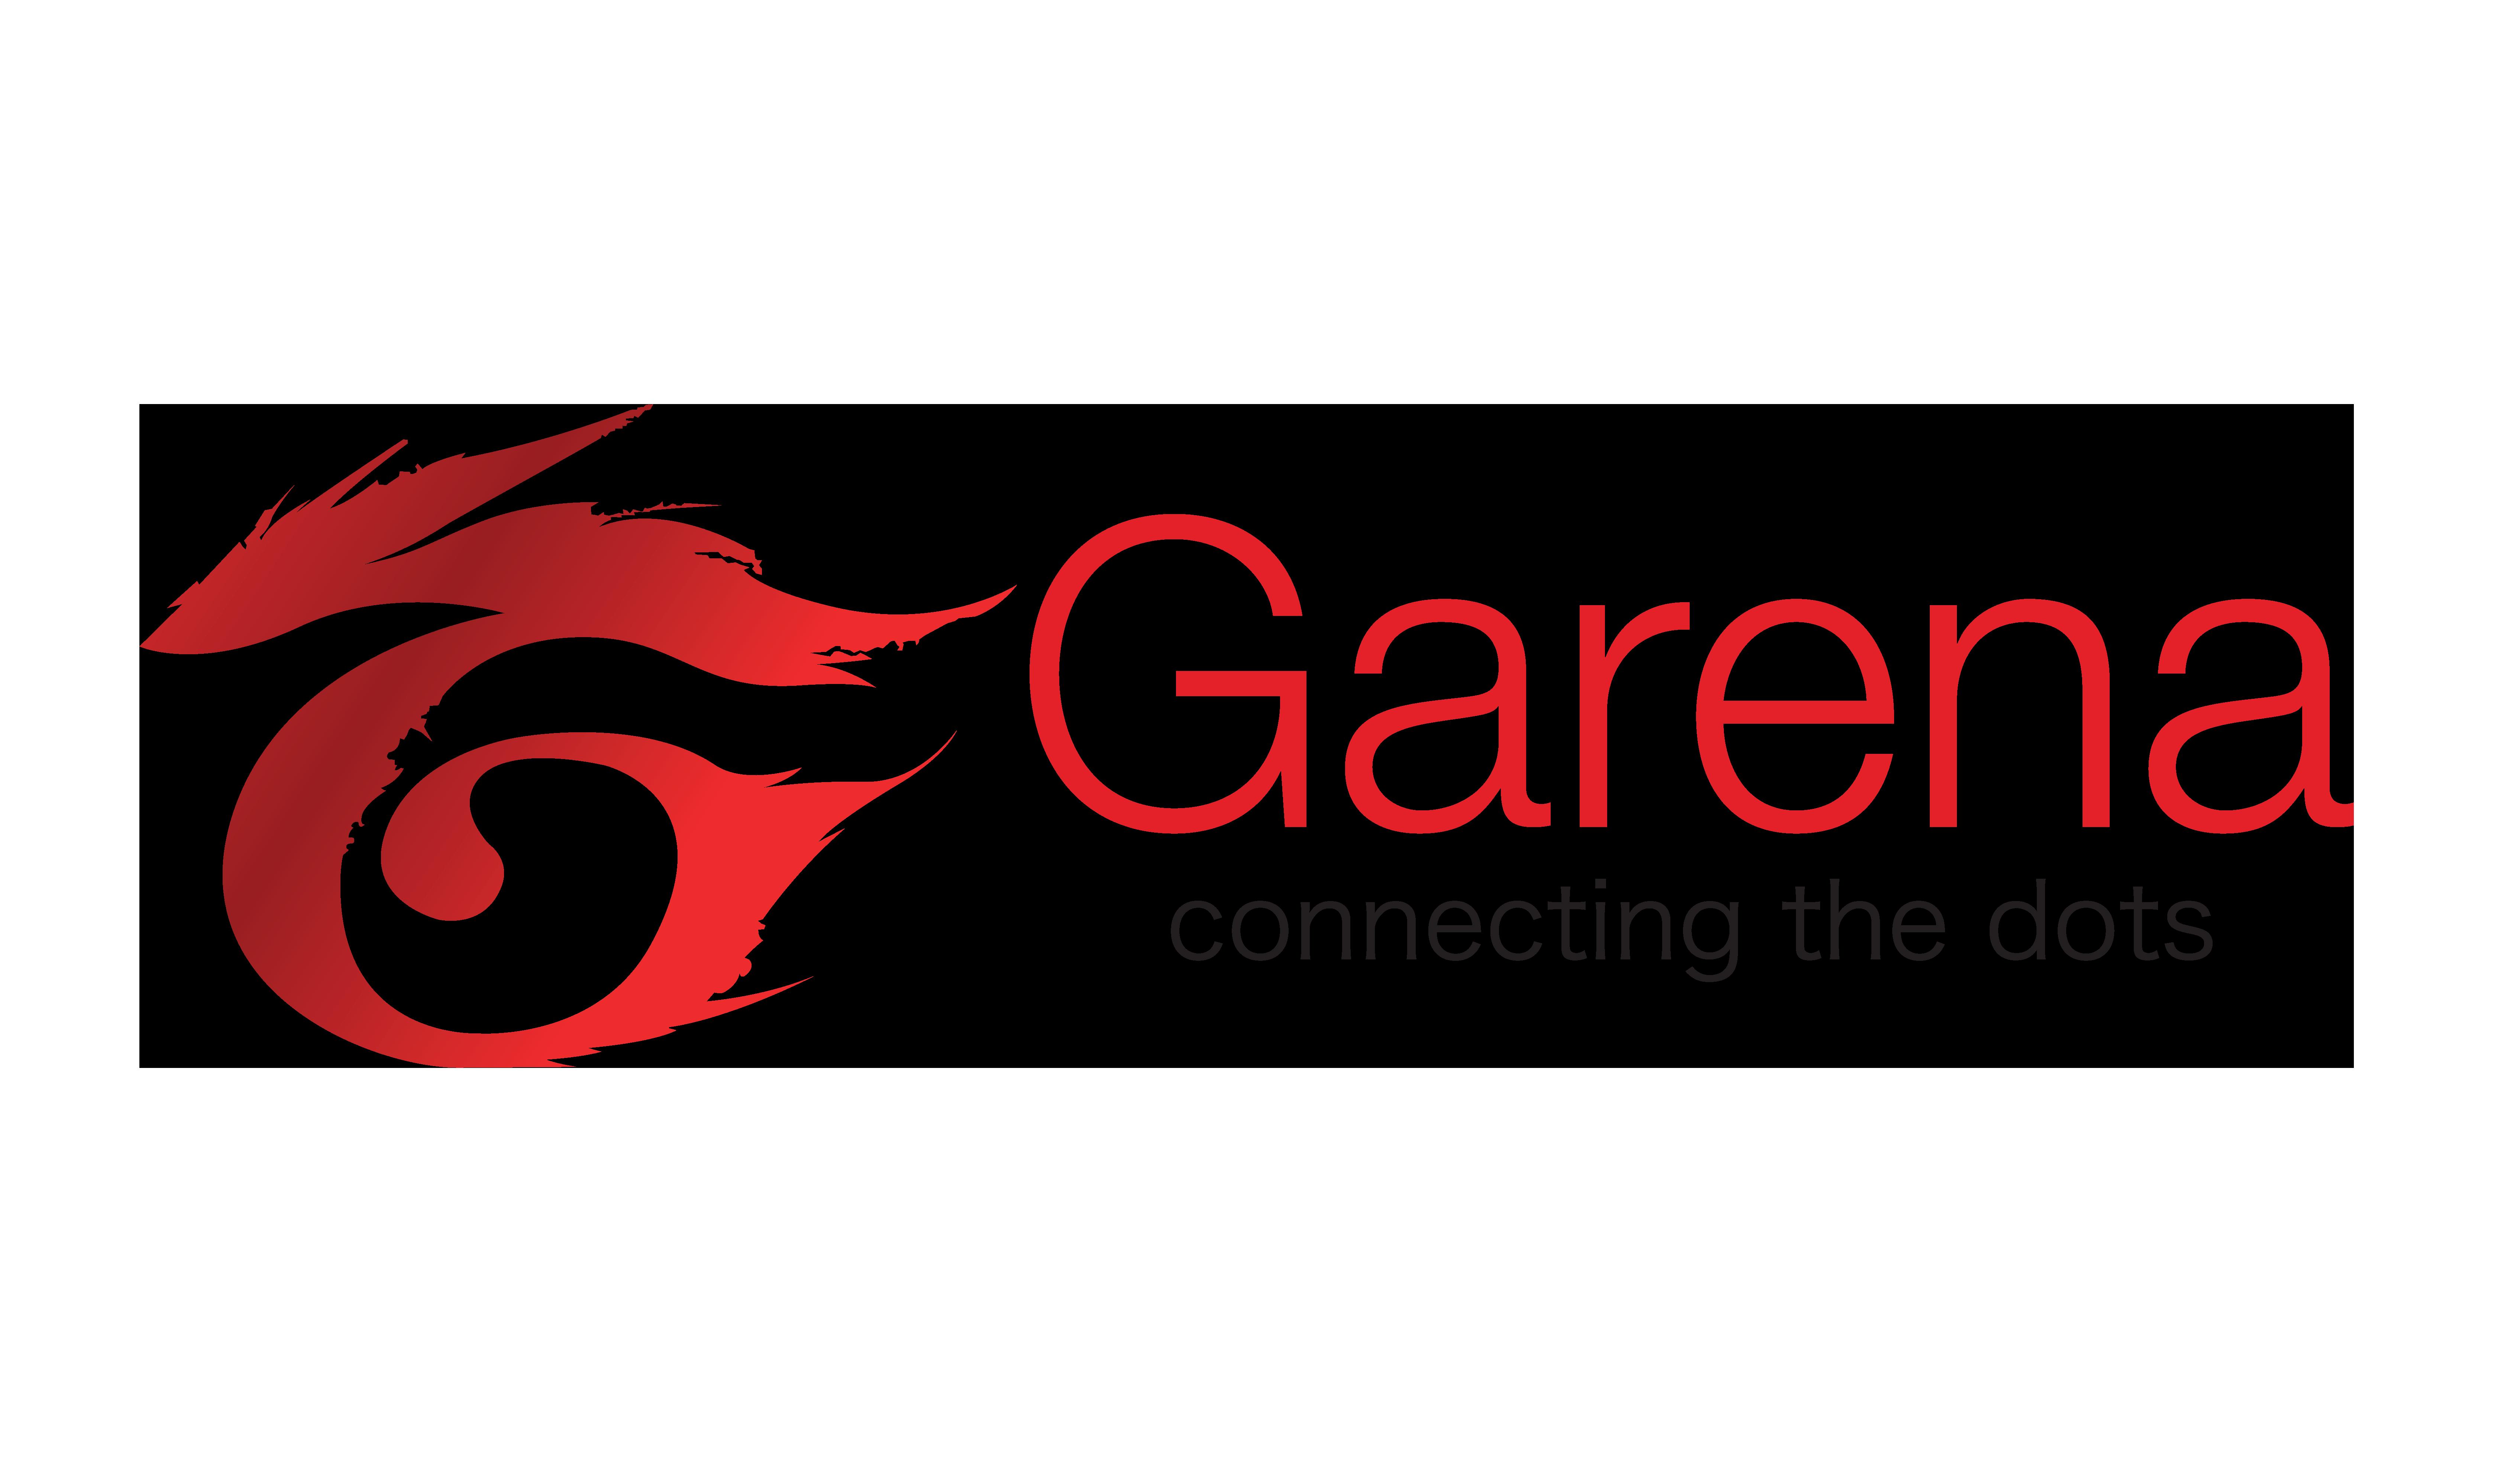 Download League Legends Fire Text Garena Of Logo Hq Png Image Freepngimg